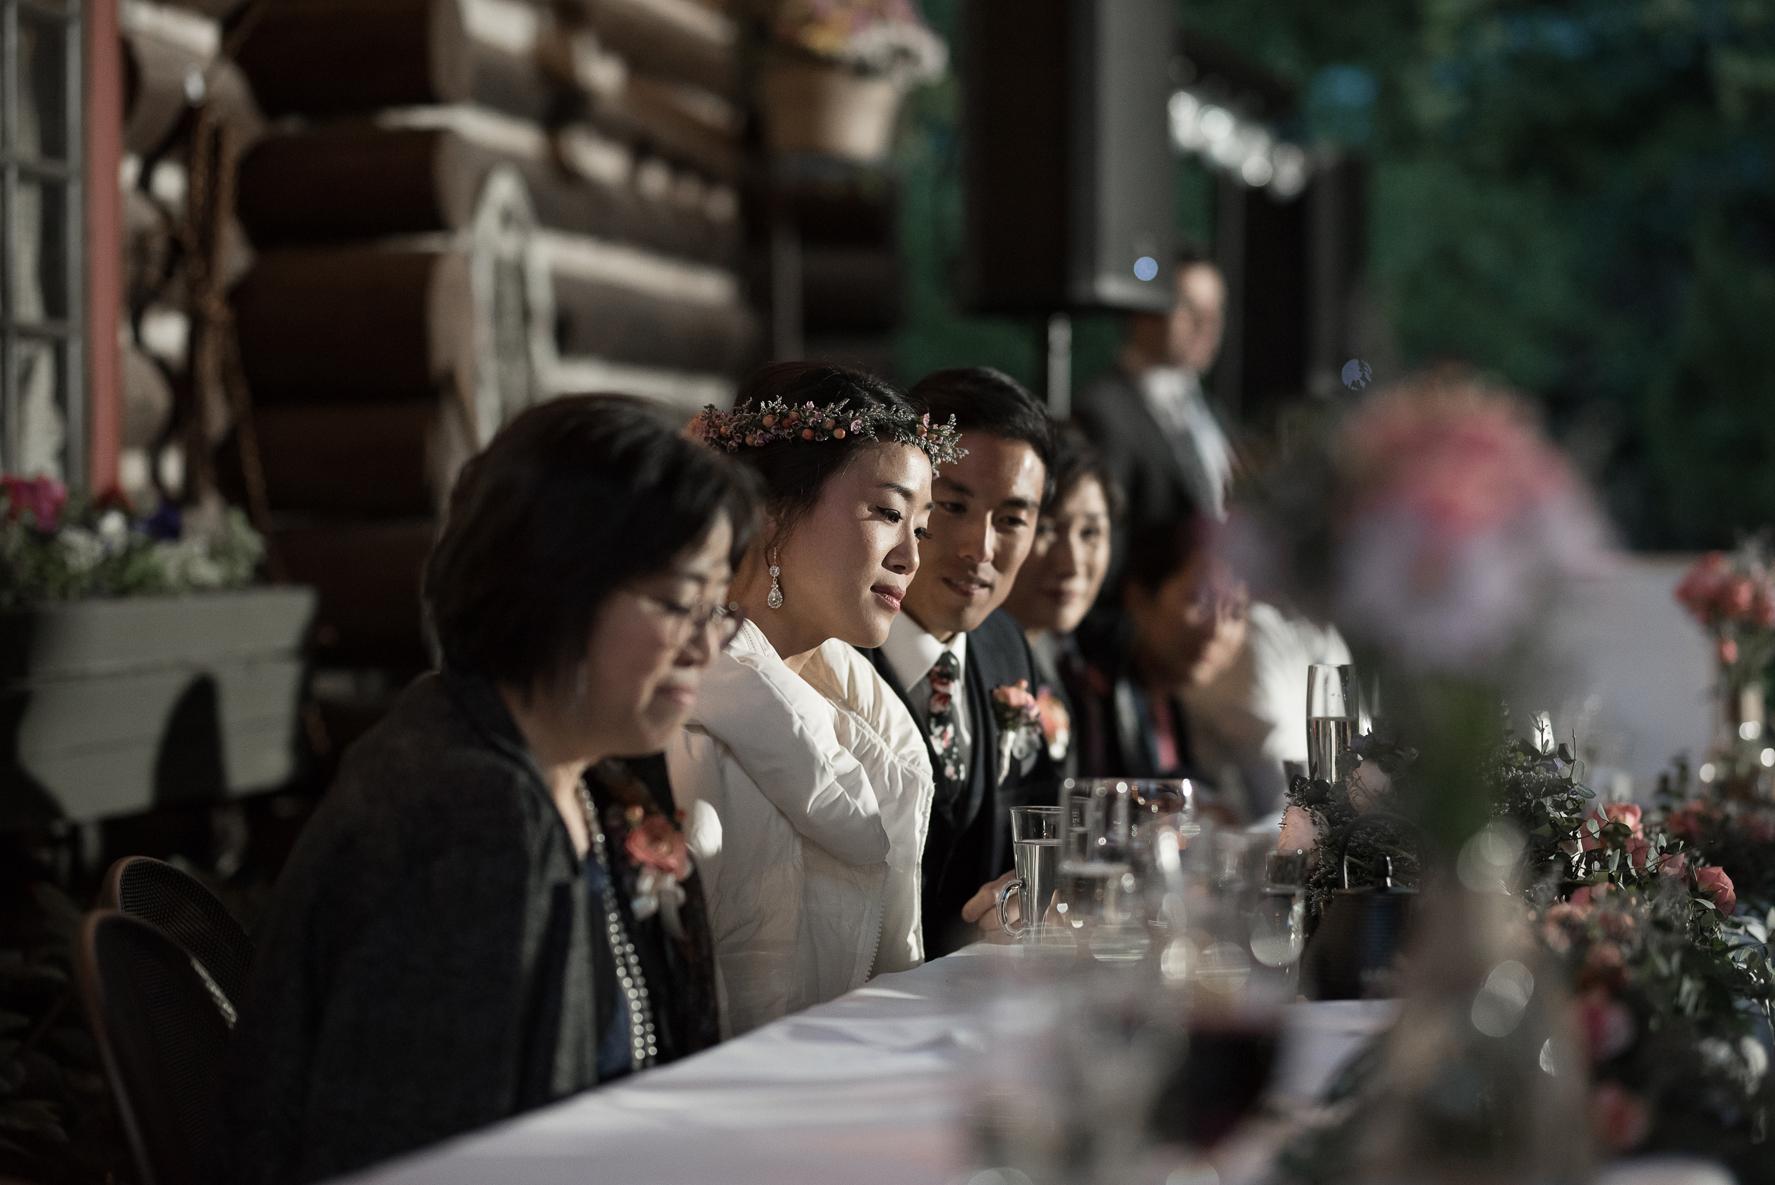 wedding speech by bride's father